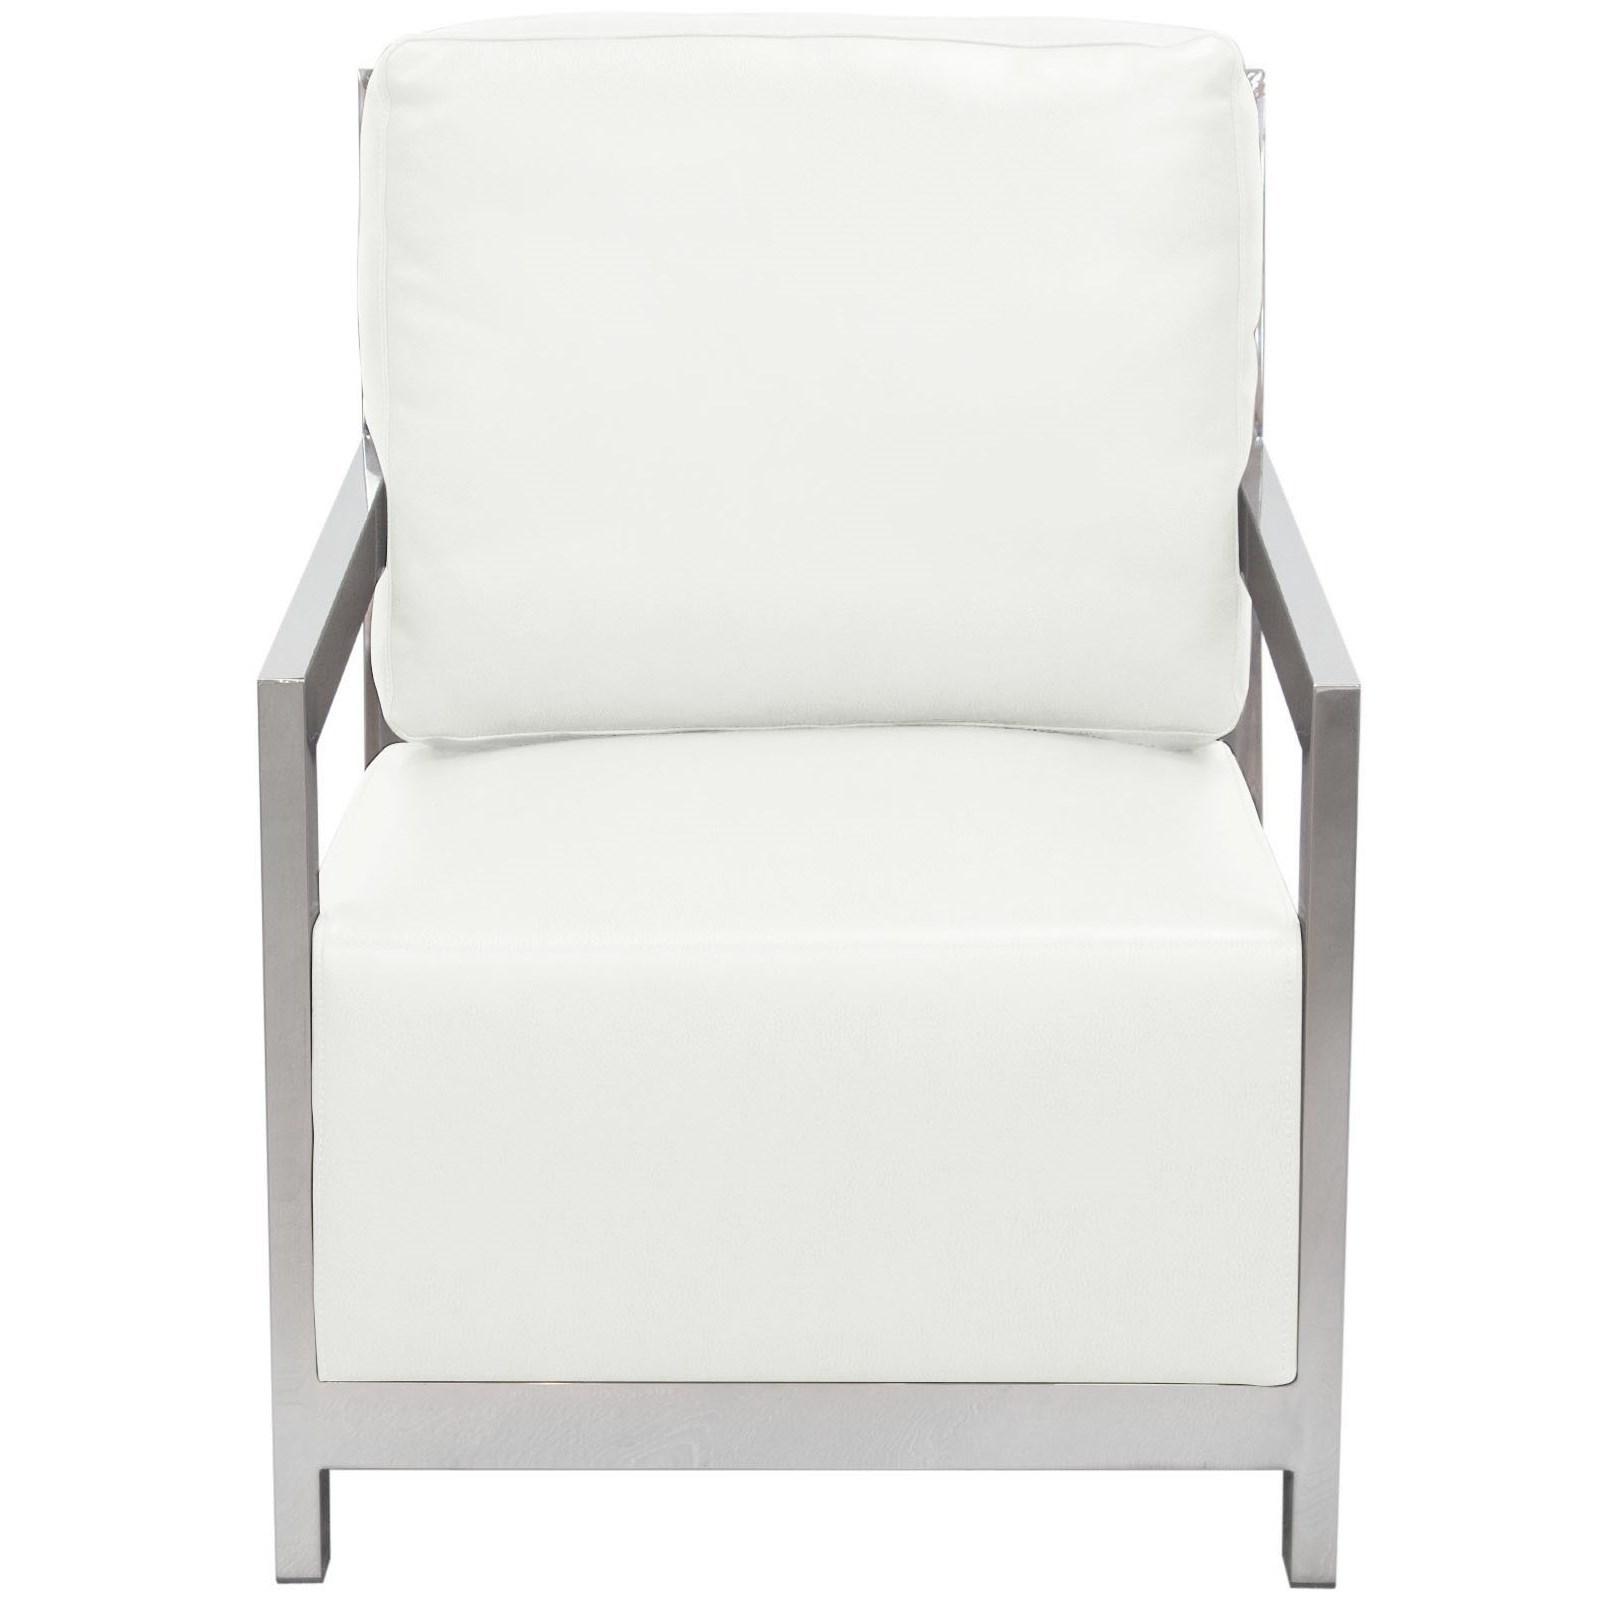 Merveilleux Diamond Sofa Zen Accent Chair   Item Number: ZENCHWH